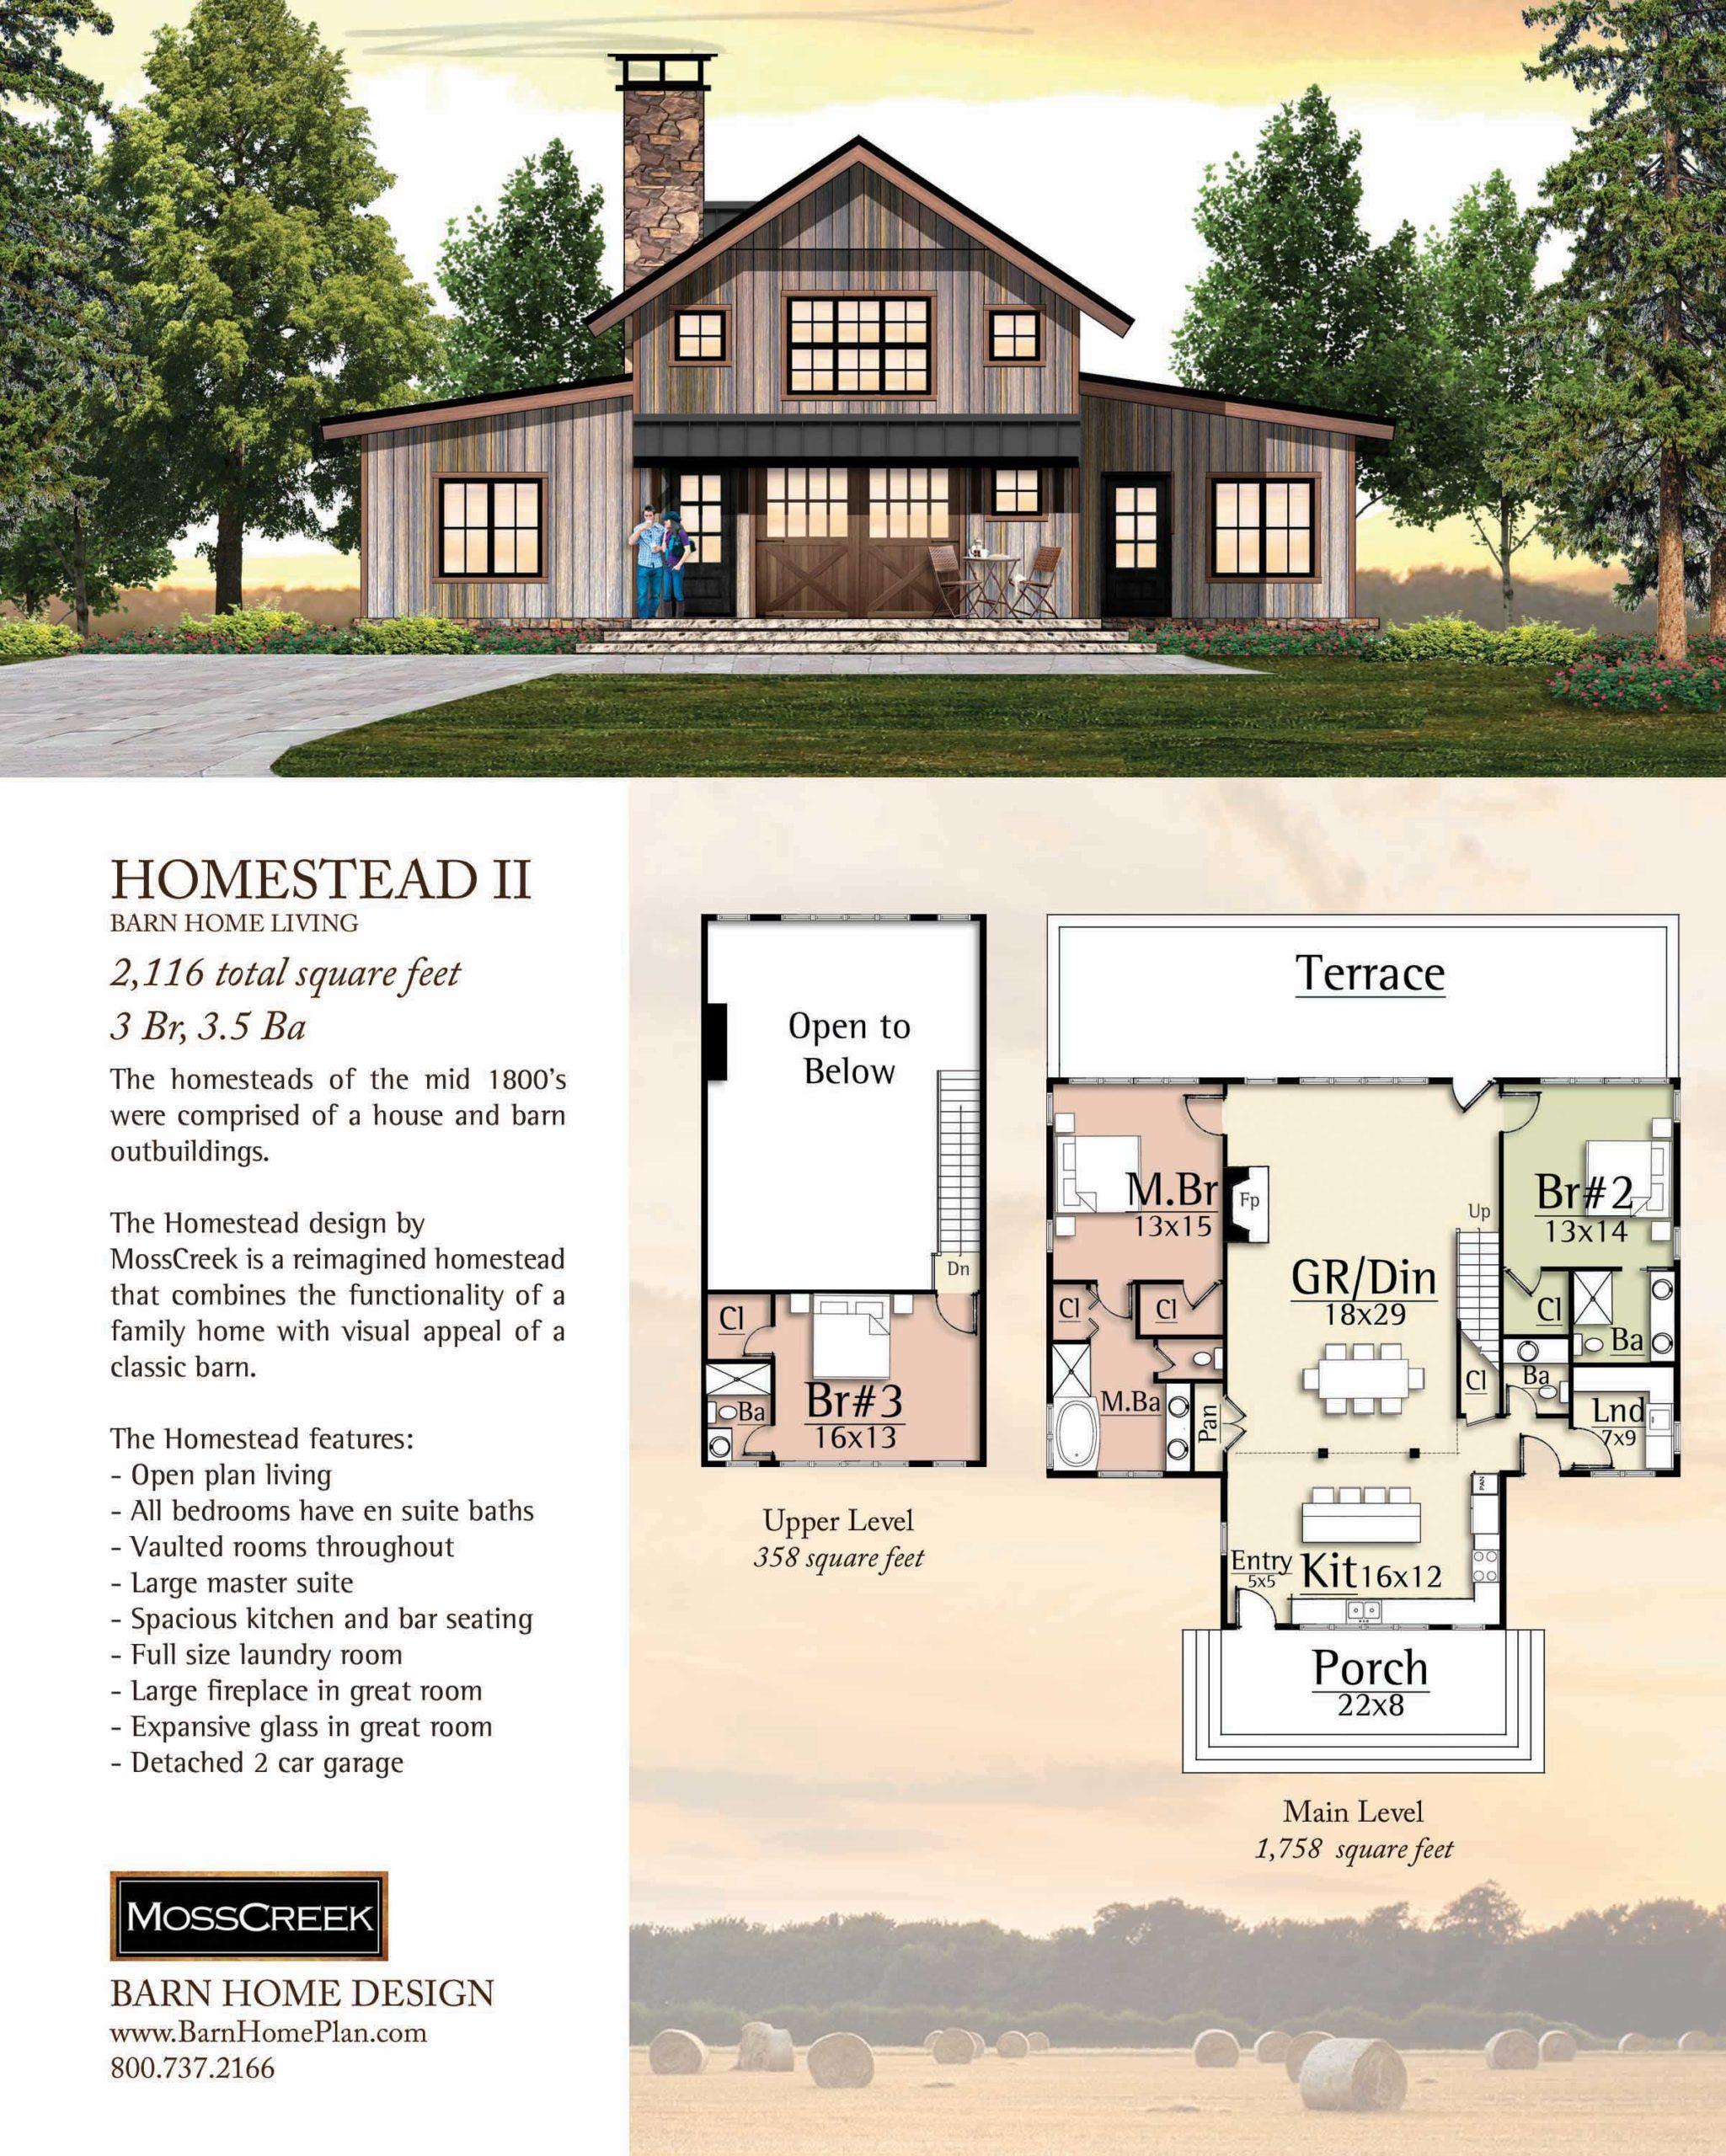 Mosscreek Homestead II Floorplan